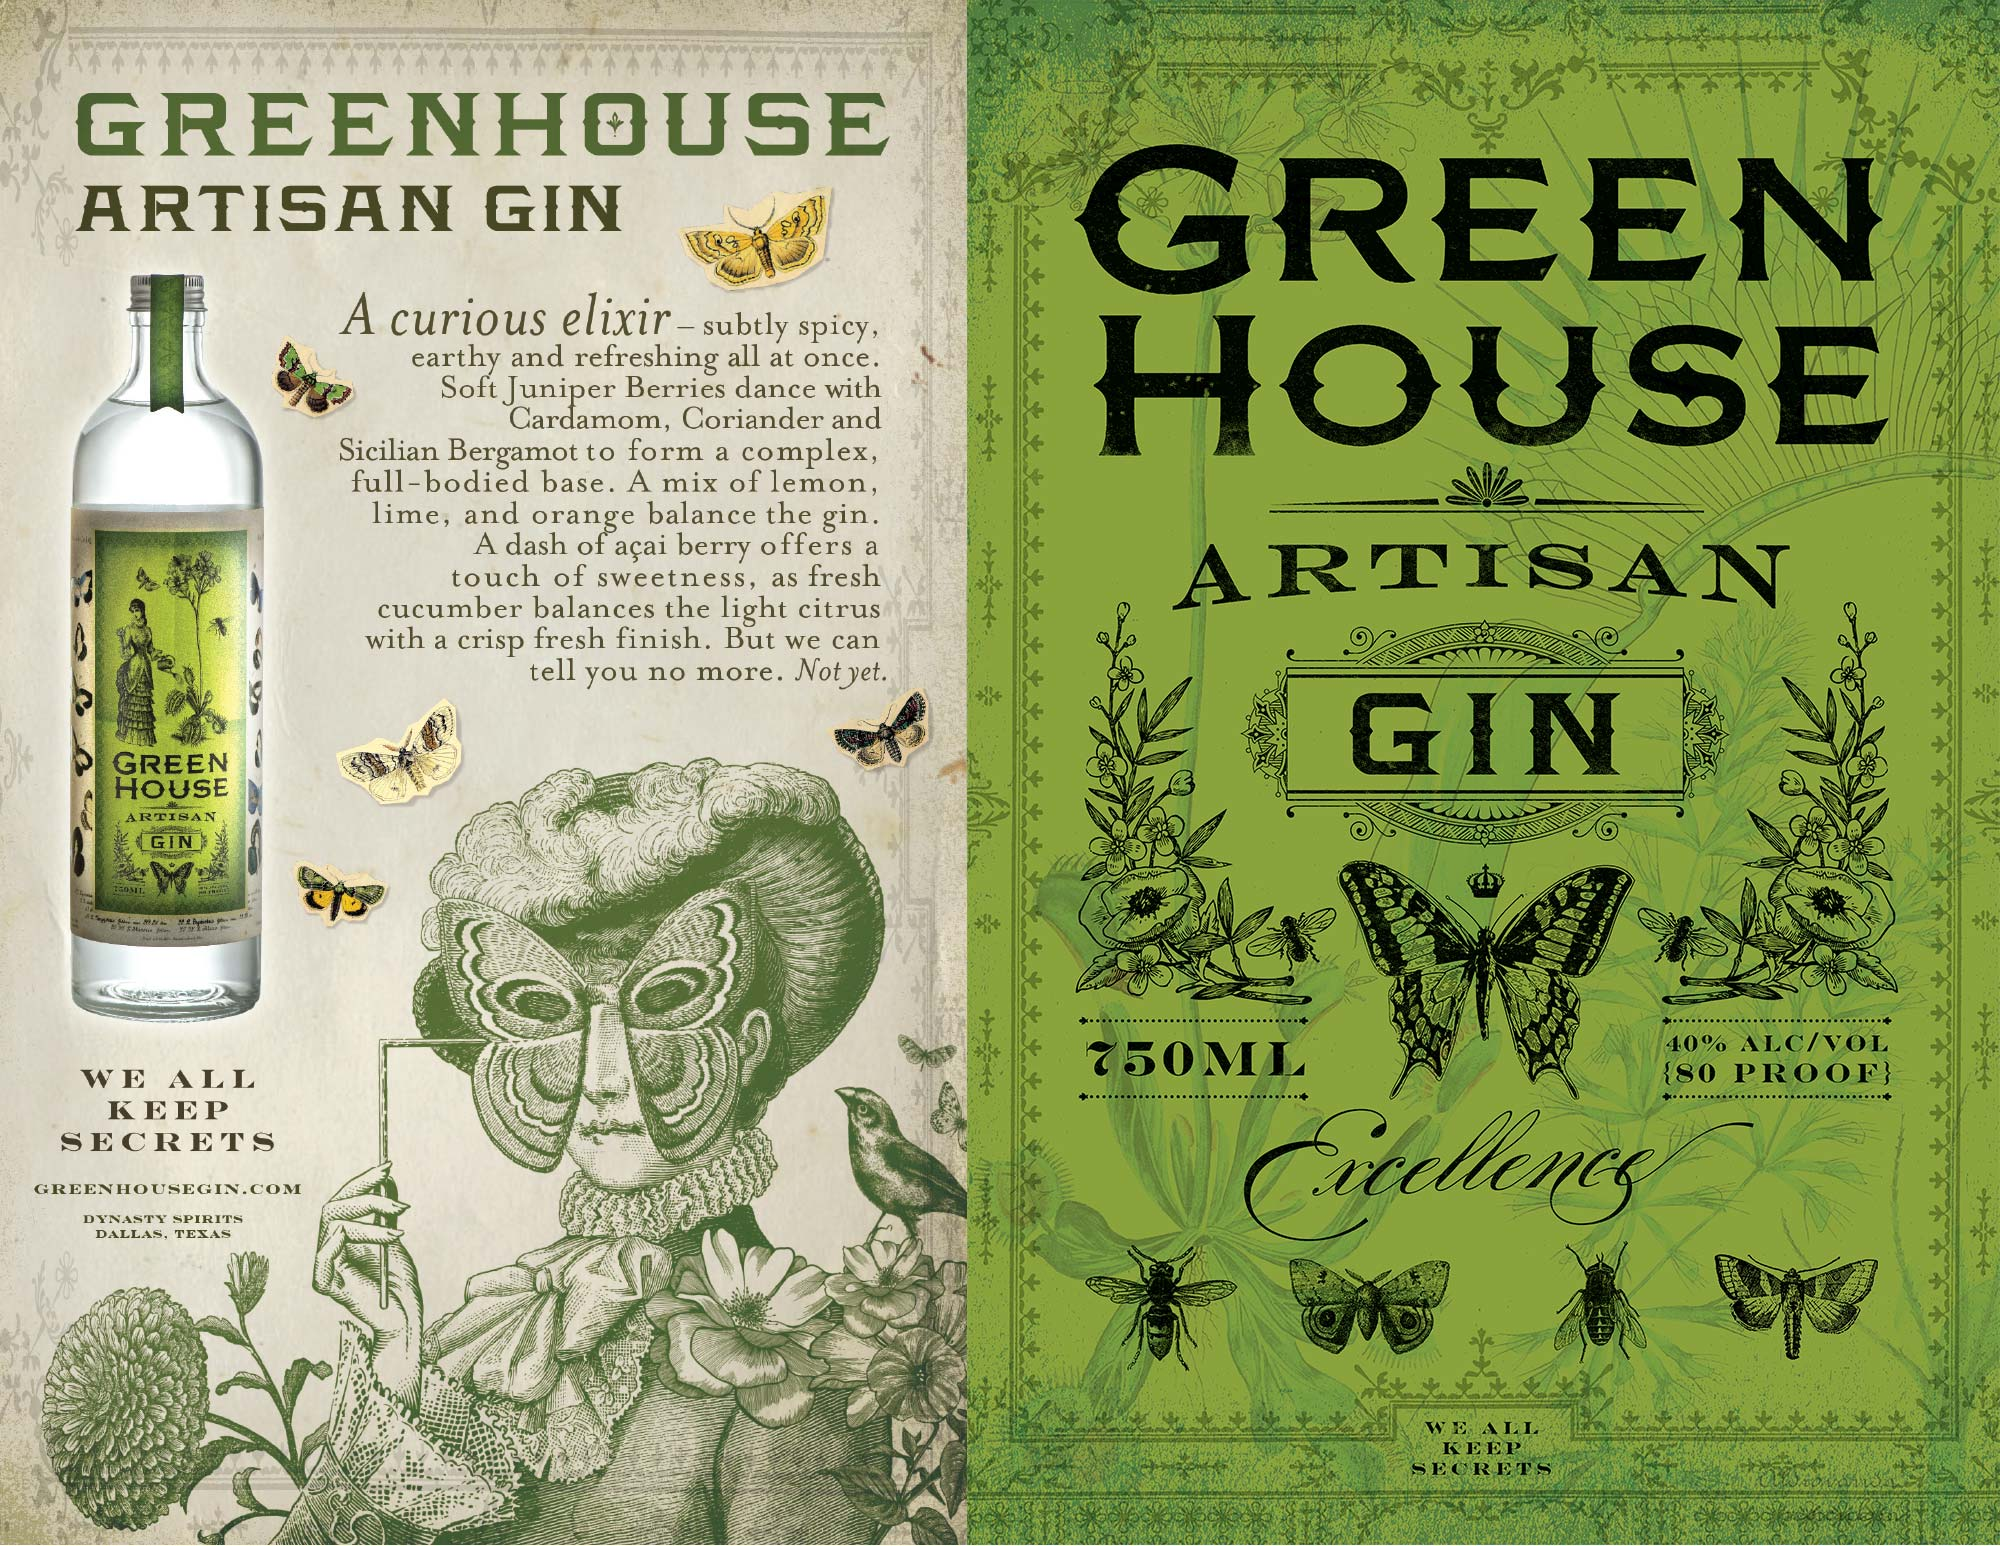 Report on Greenhouse Calculator